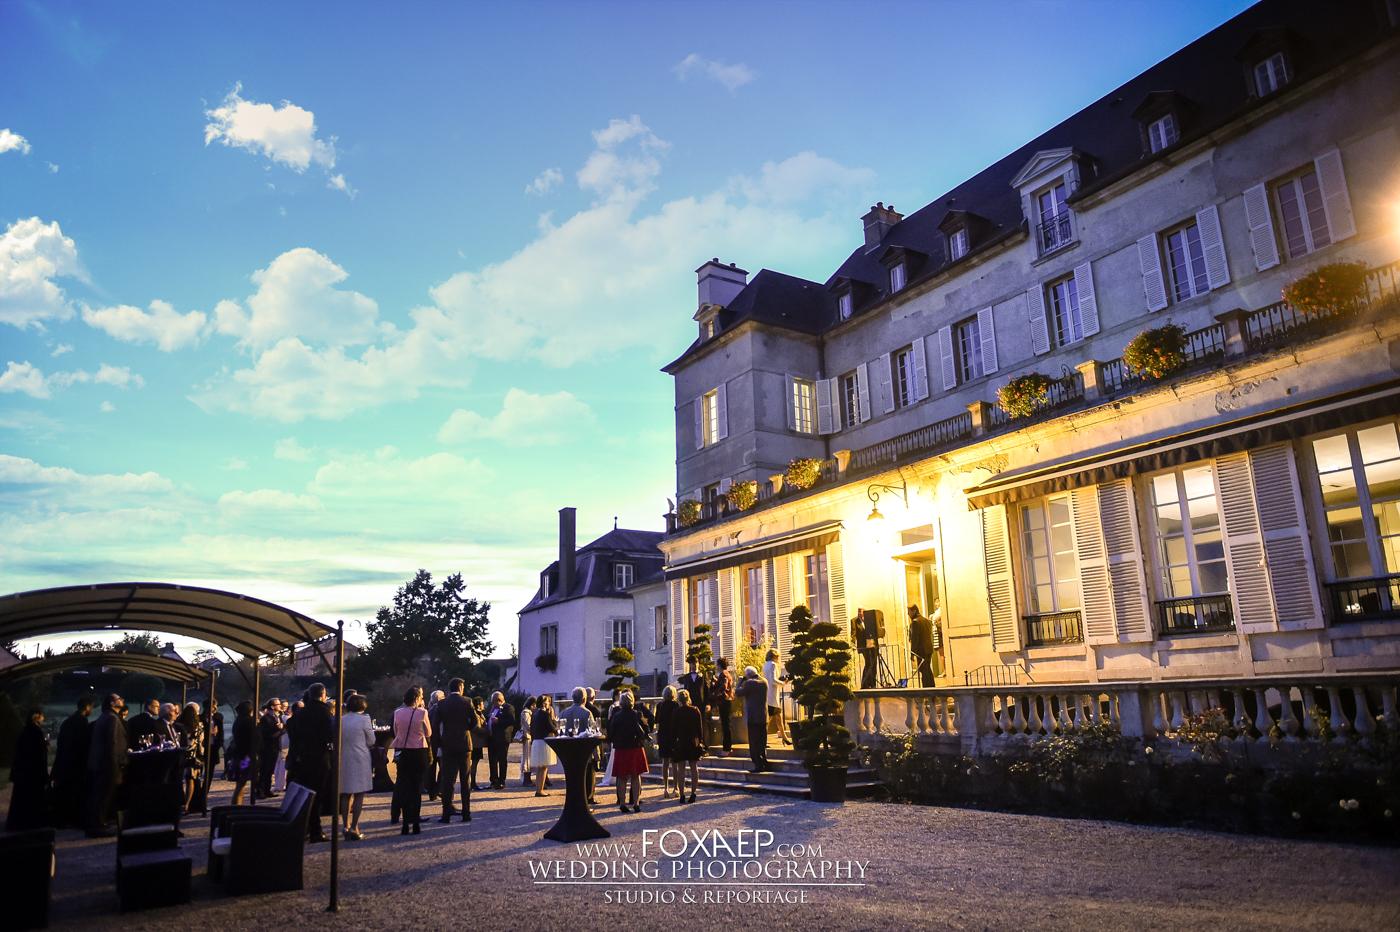 chateau saulon mariage dijon bourgogne 4882 chateau saulon mariage dijon bourgogne 4882 - Chateau De Saulon Mariage